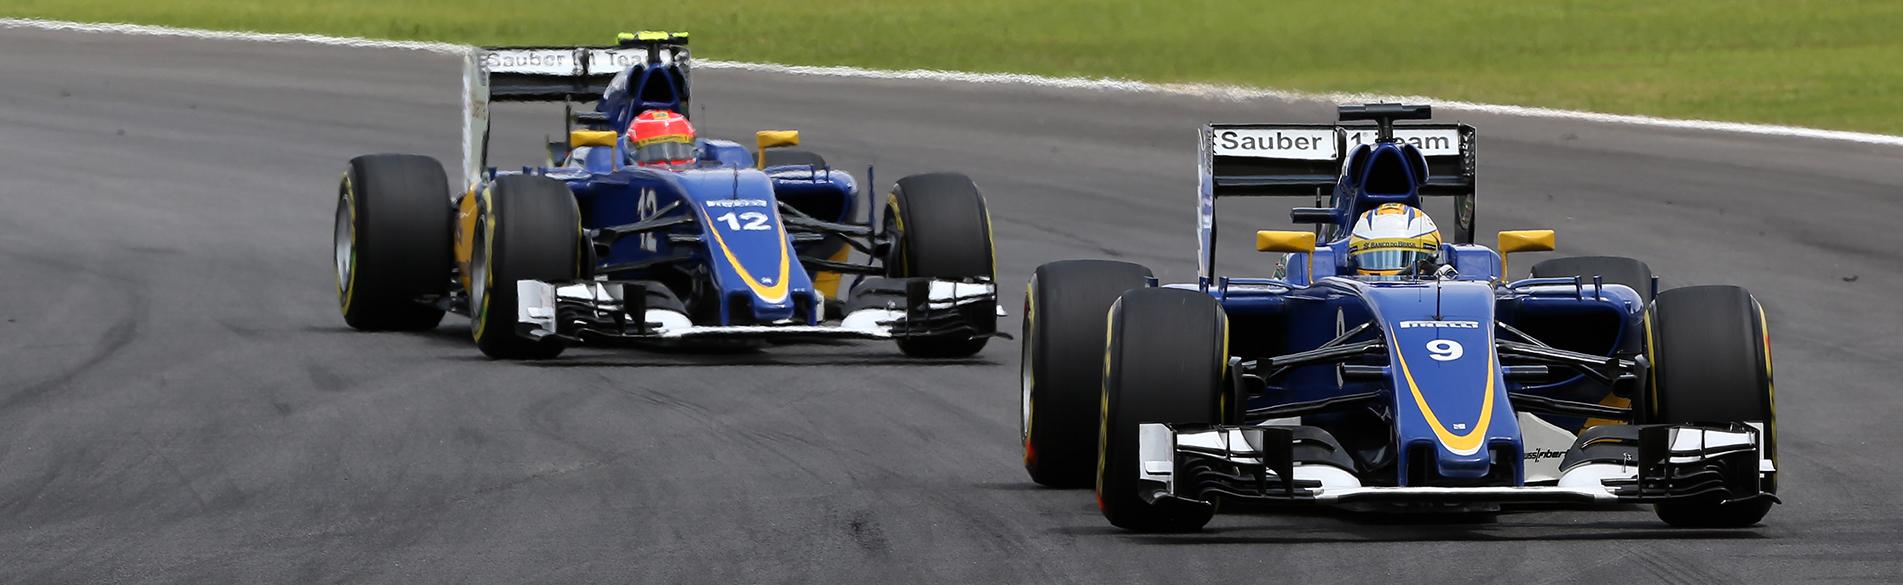 Titelbild Vereinsmagazin Formel 1